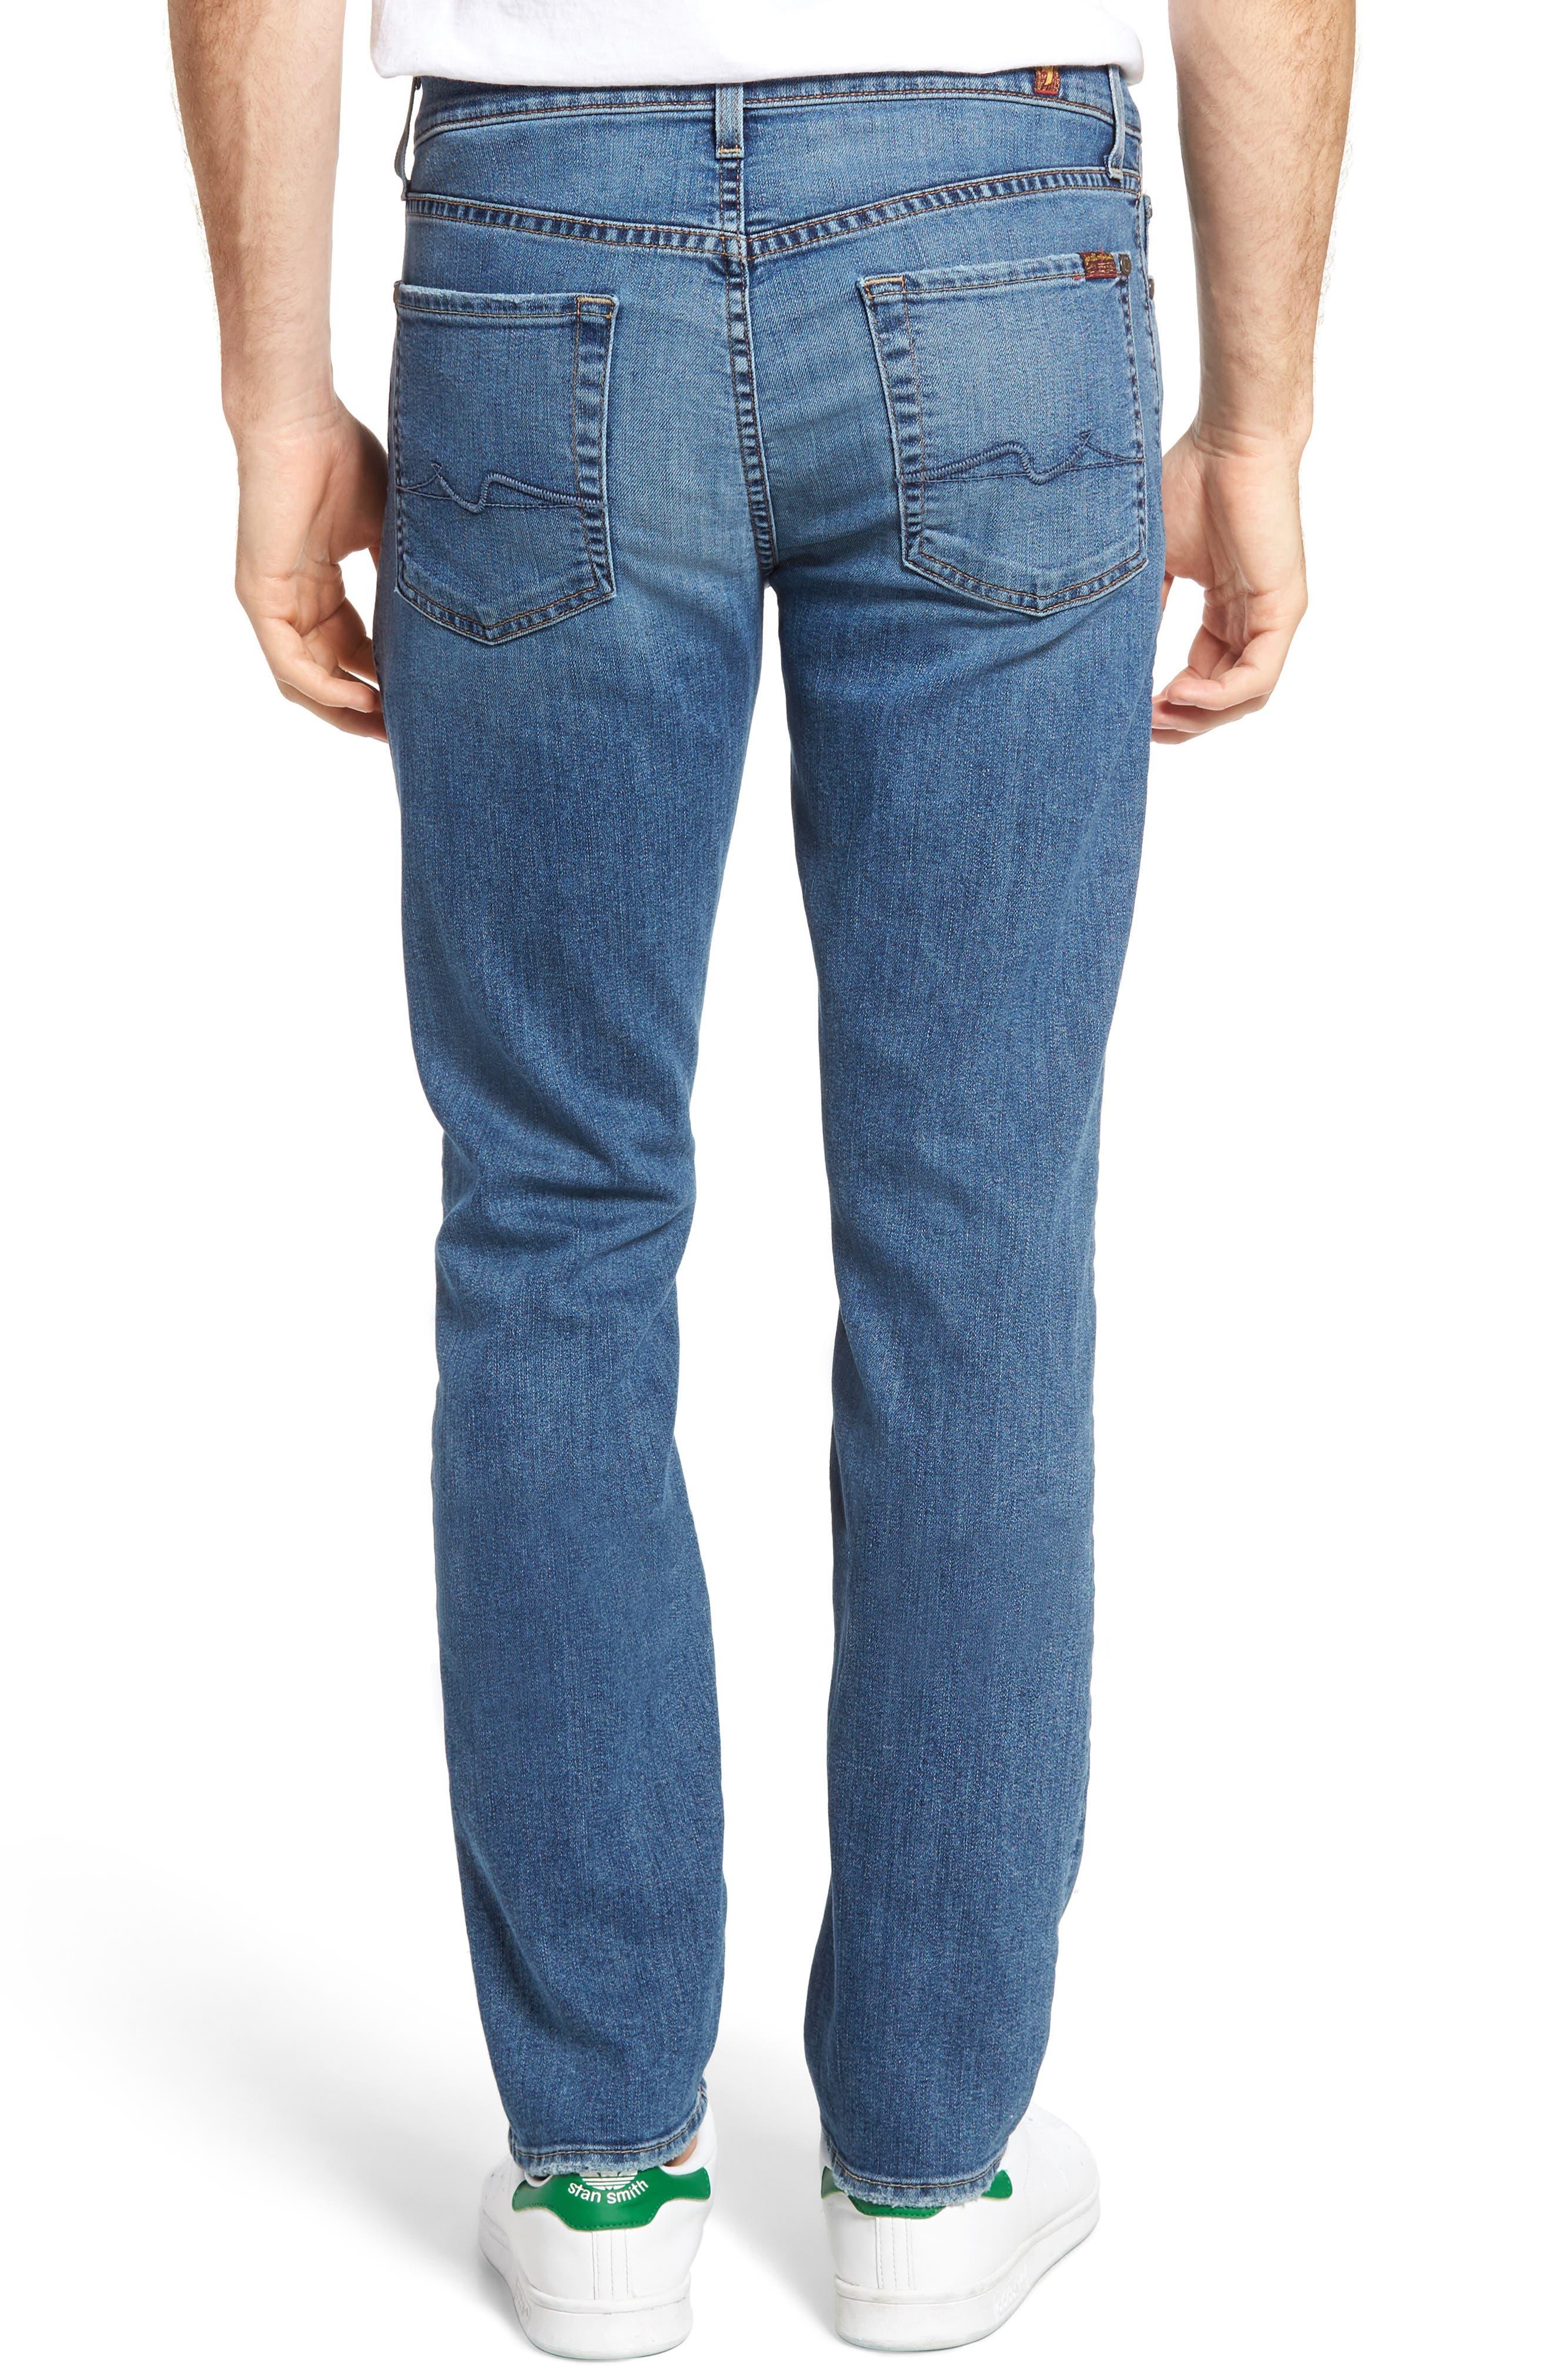 Slimmy Slim Fit Jeans,                             Alternate thumbnail 2, color,                             405